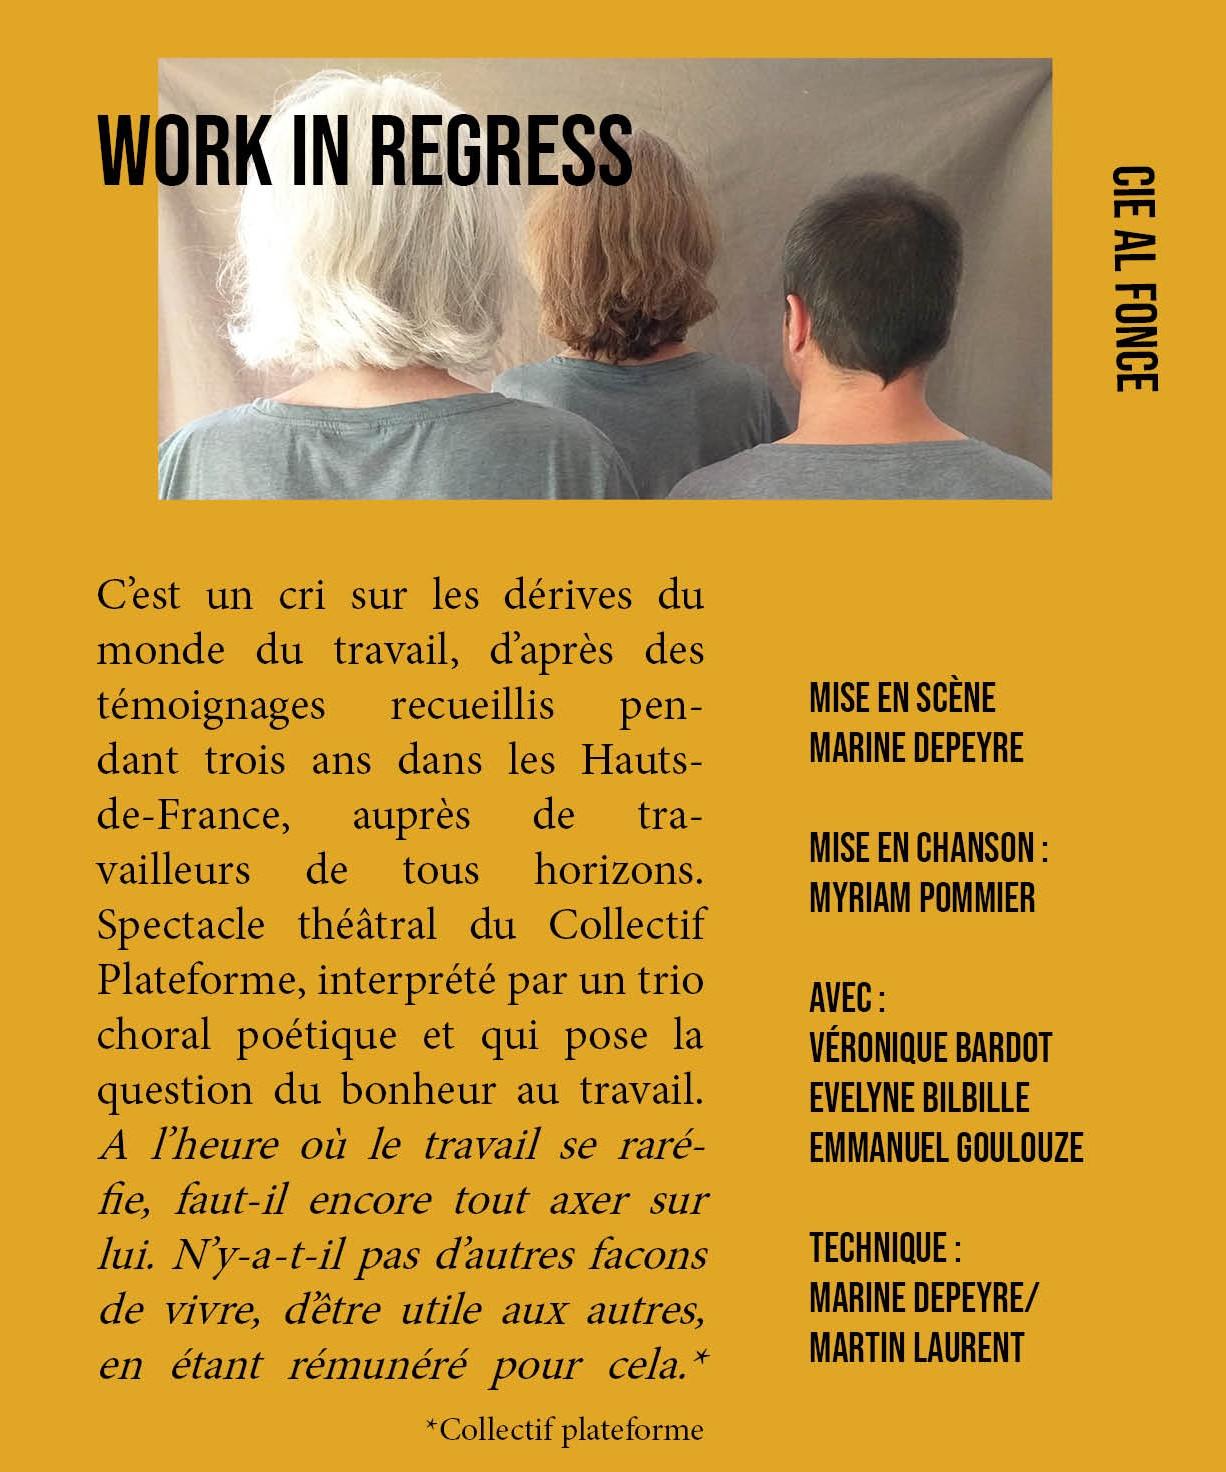 Work in regress1